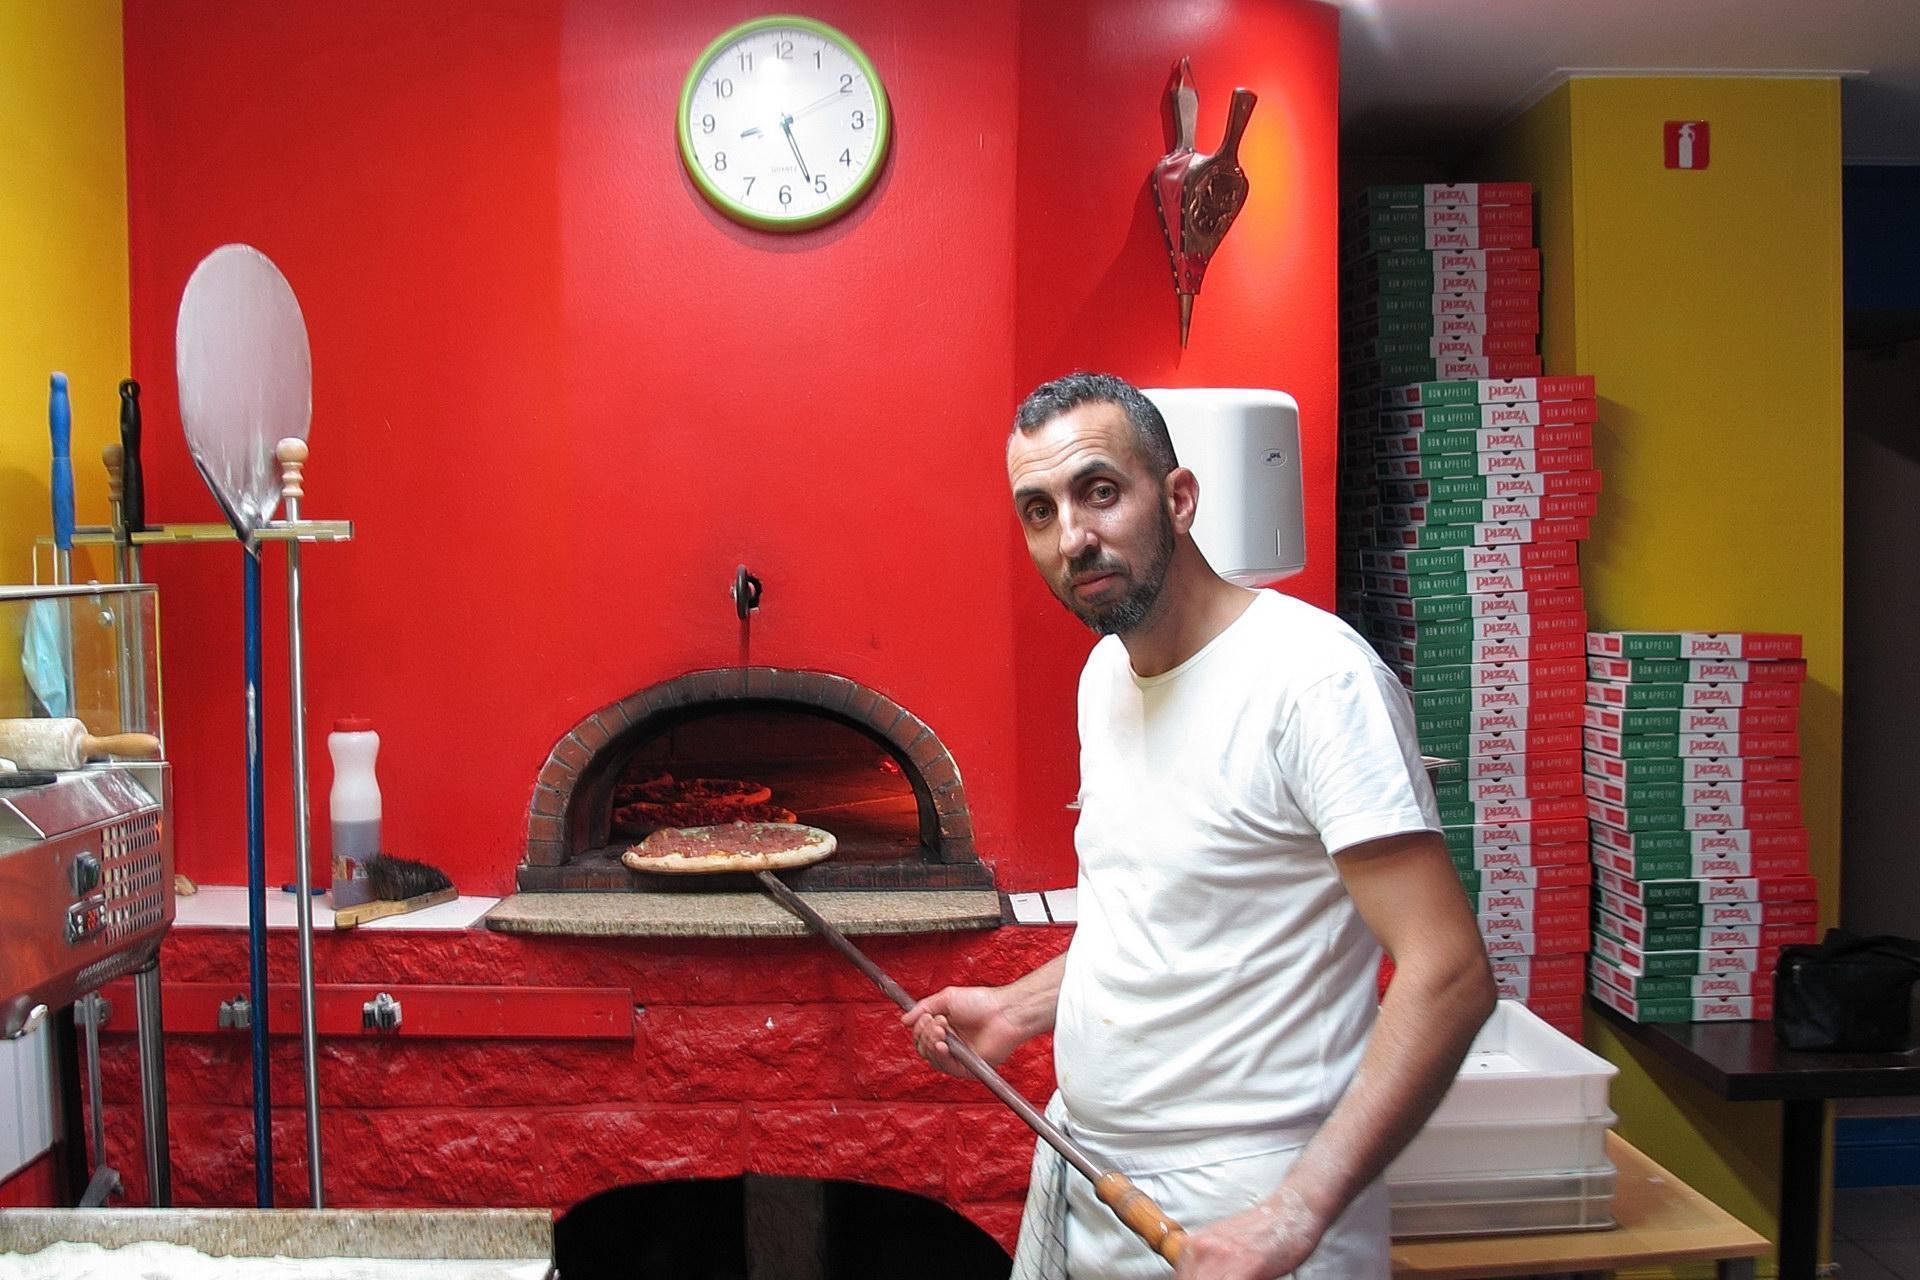 Le-Mediterraneen-Pizza-Braine-l-Alleud-0020.jpg